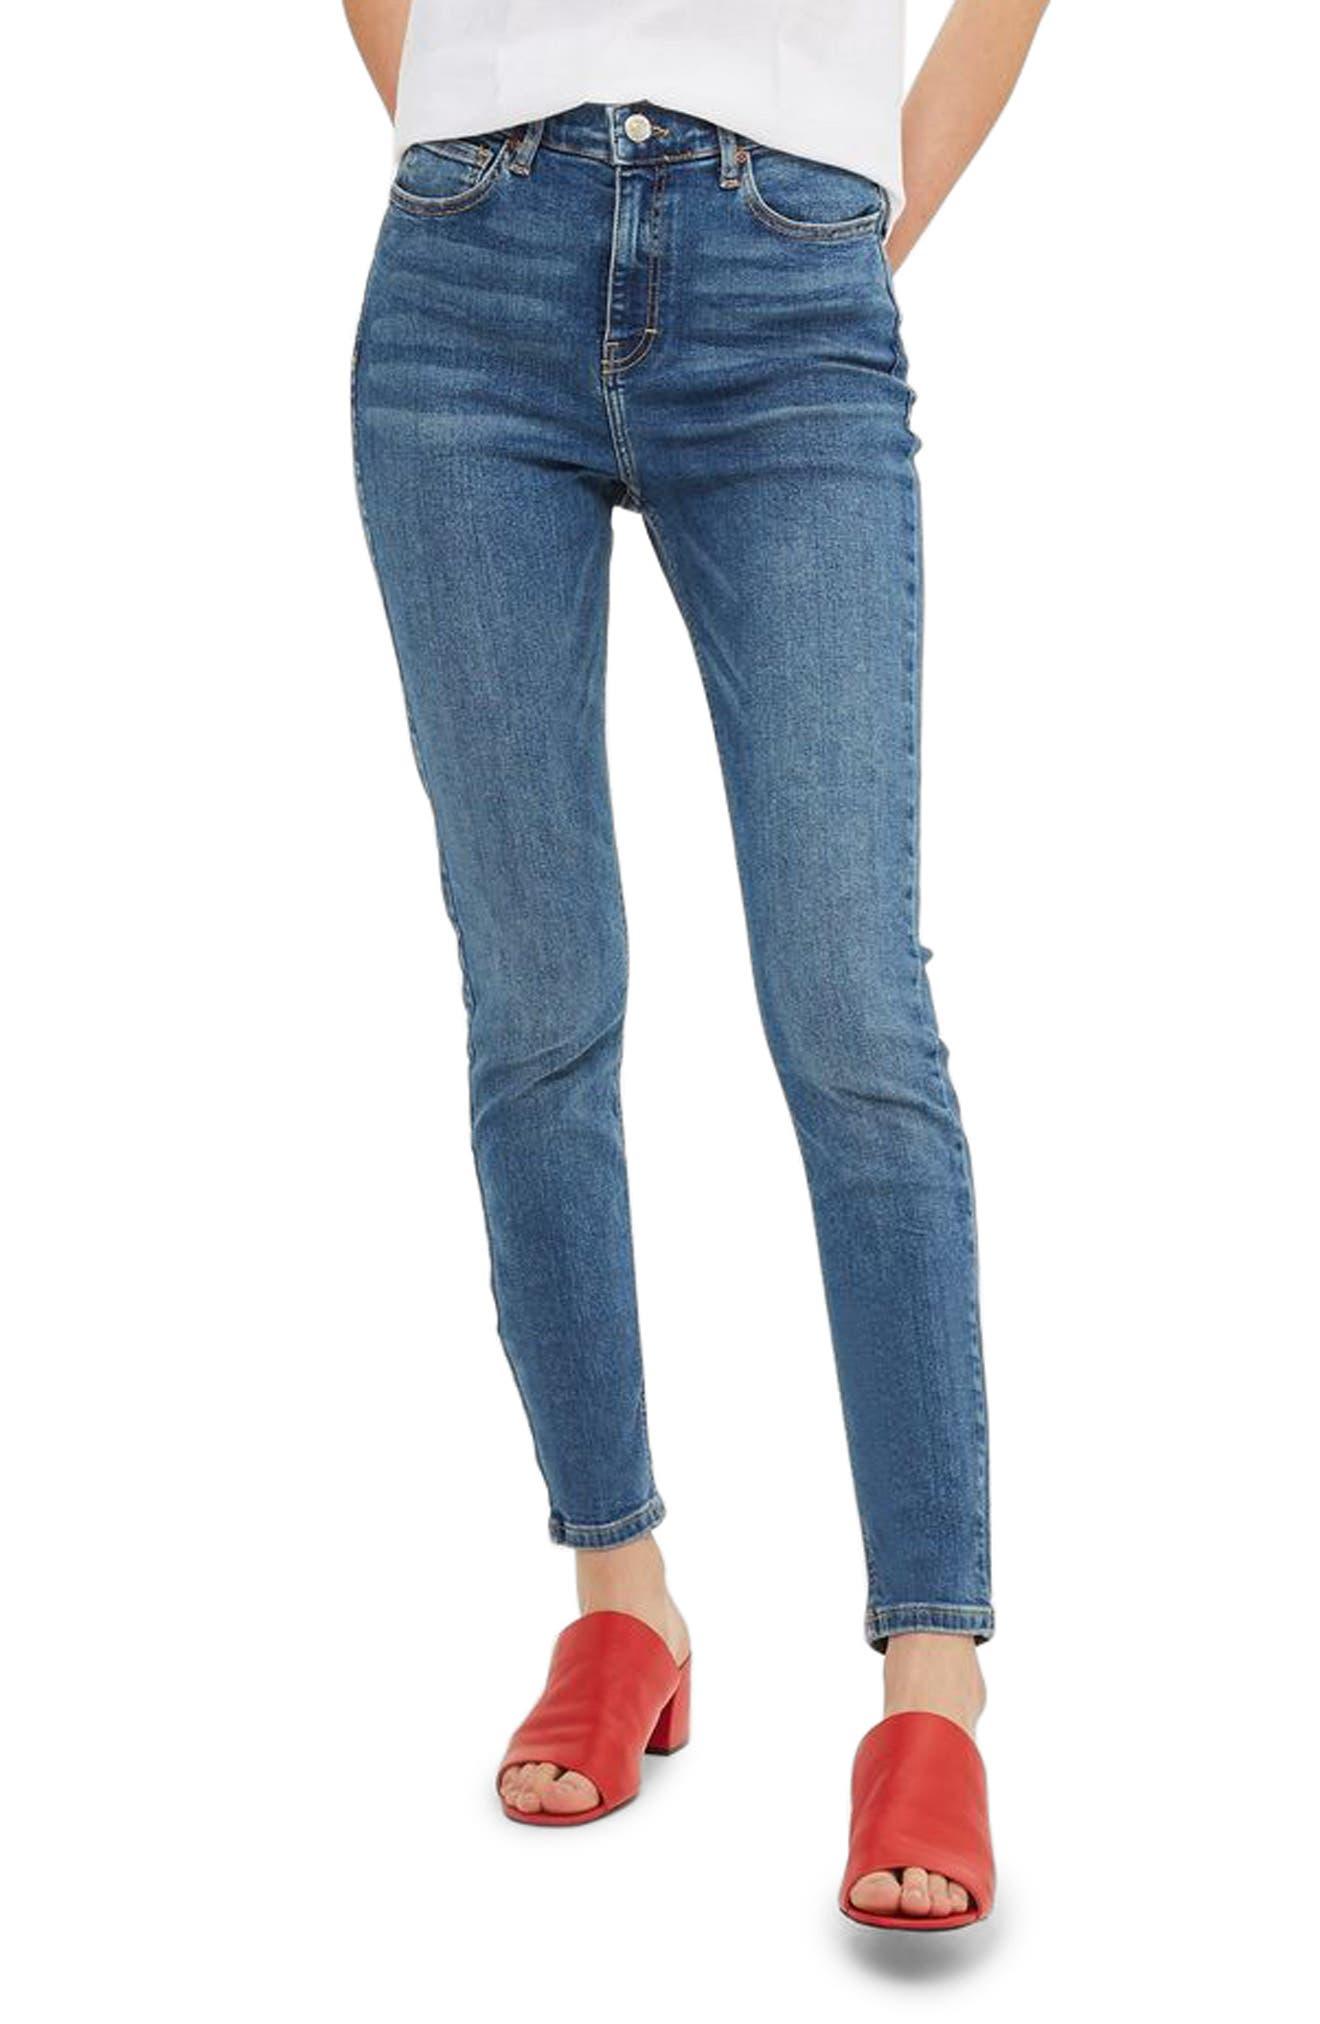 Topshop Jamie High Waist Ankle Skinny Jeans (Tall)